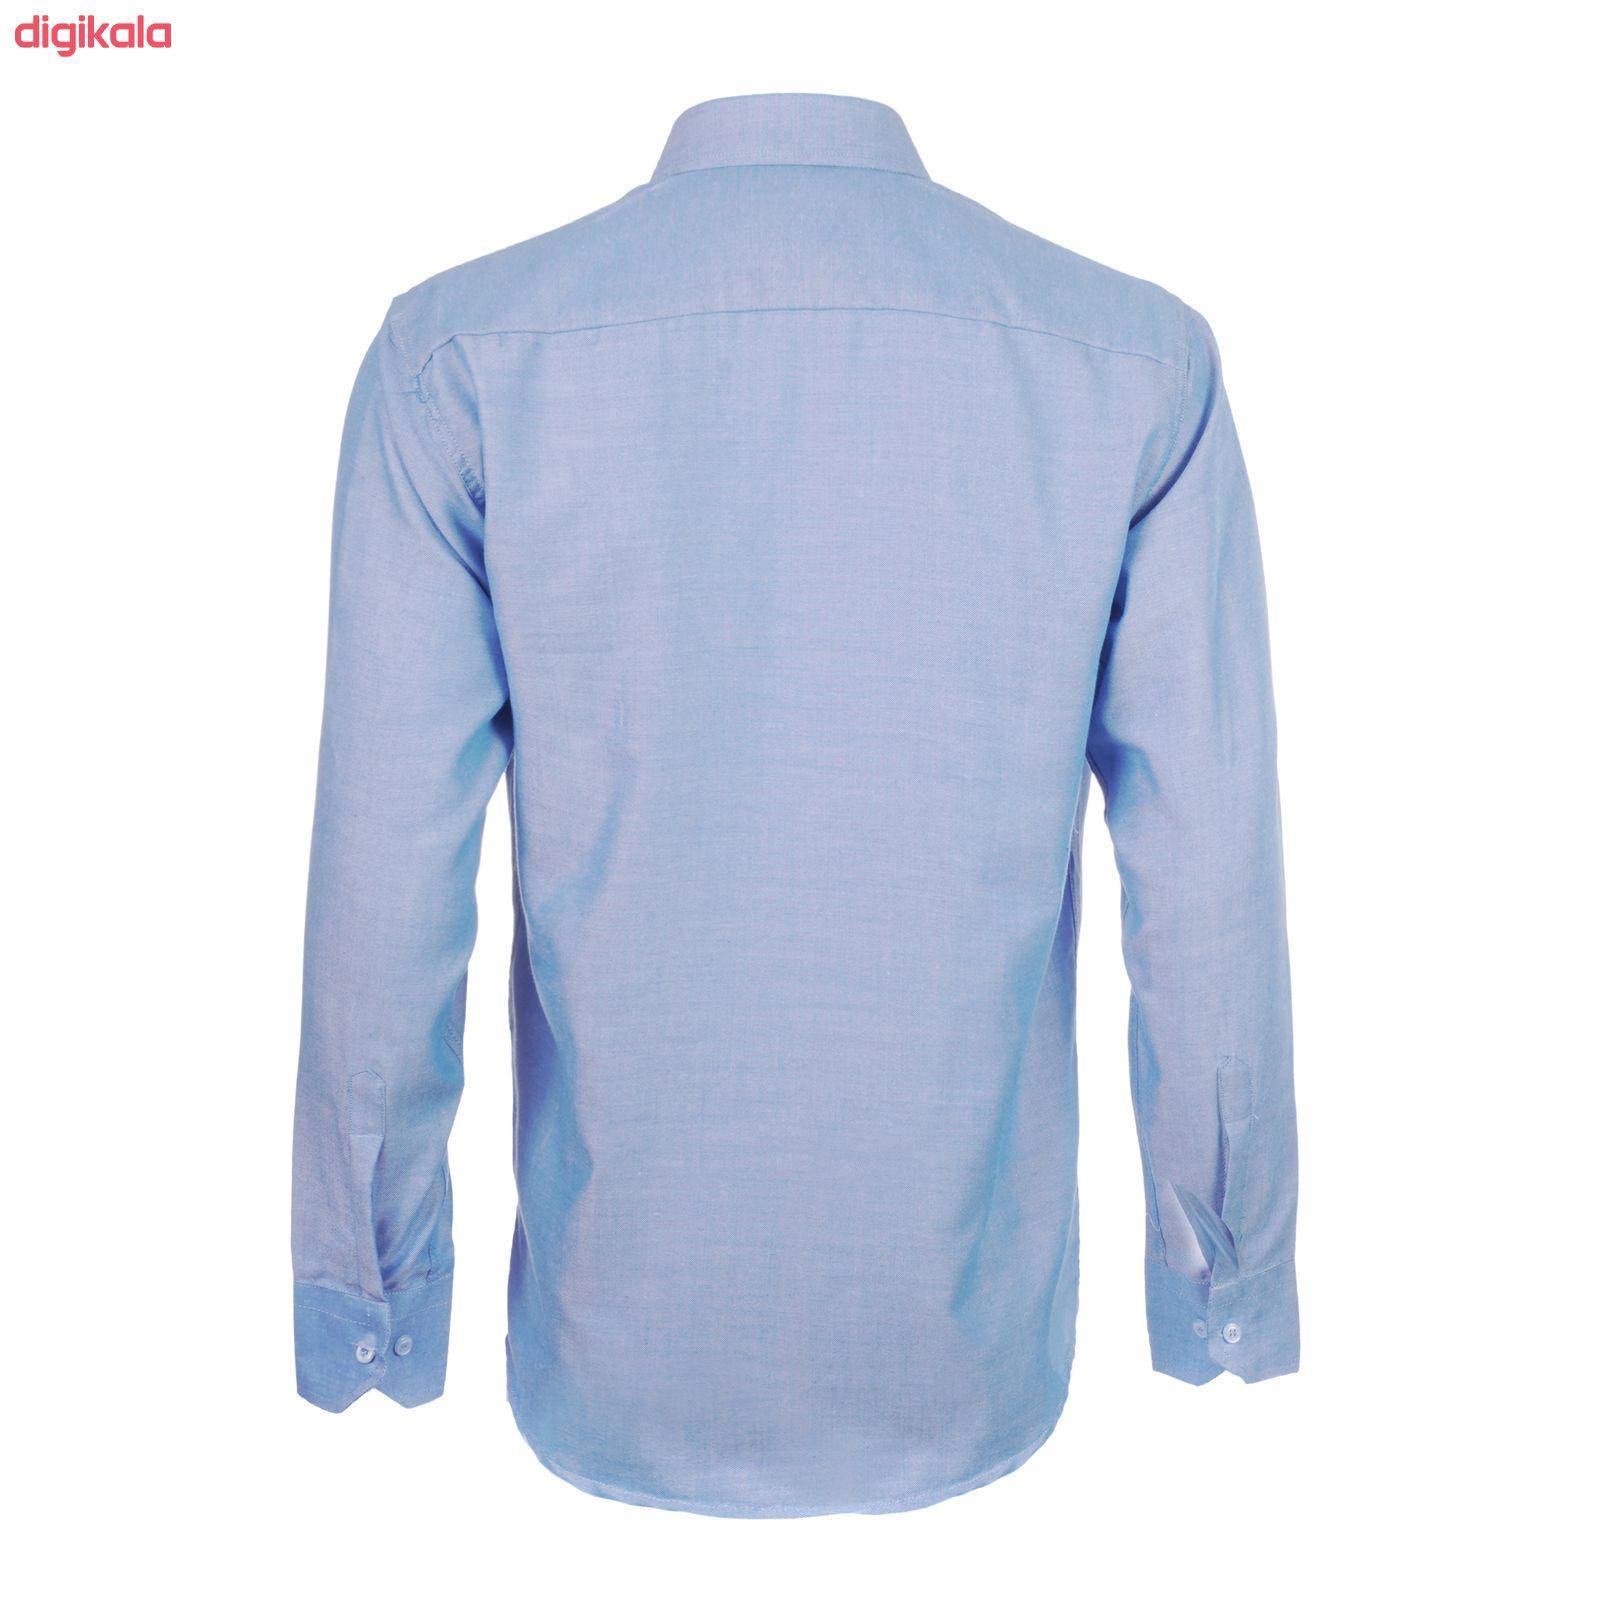 پیراهن آستین بلند مردانه ناوالس مدل Pk3-8020-BL main 1 1